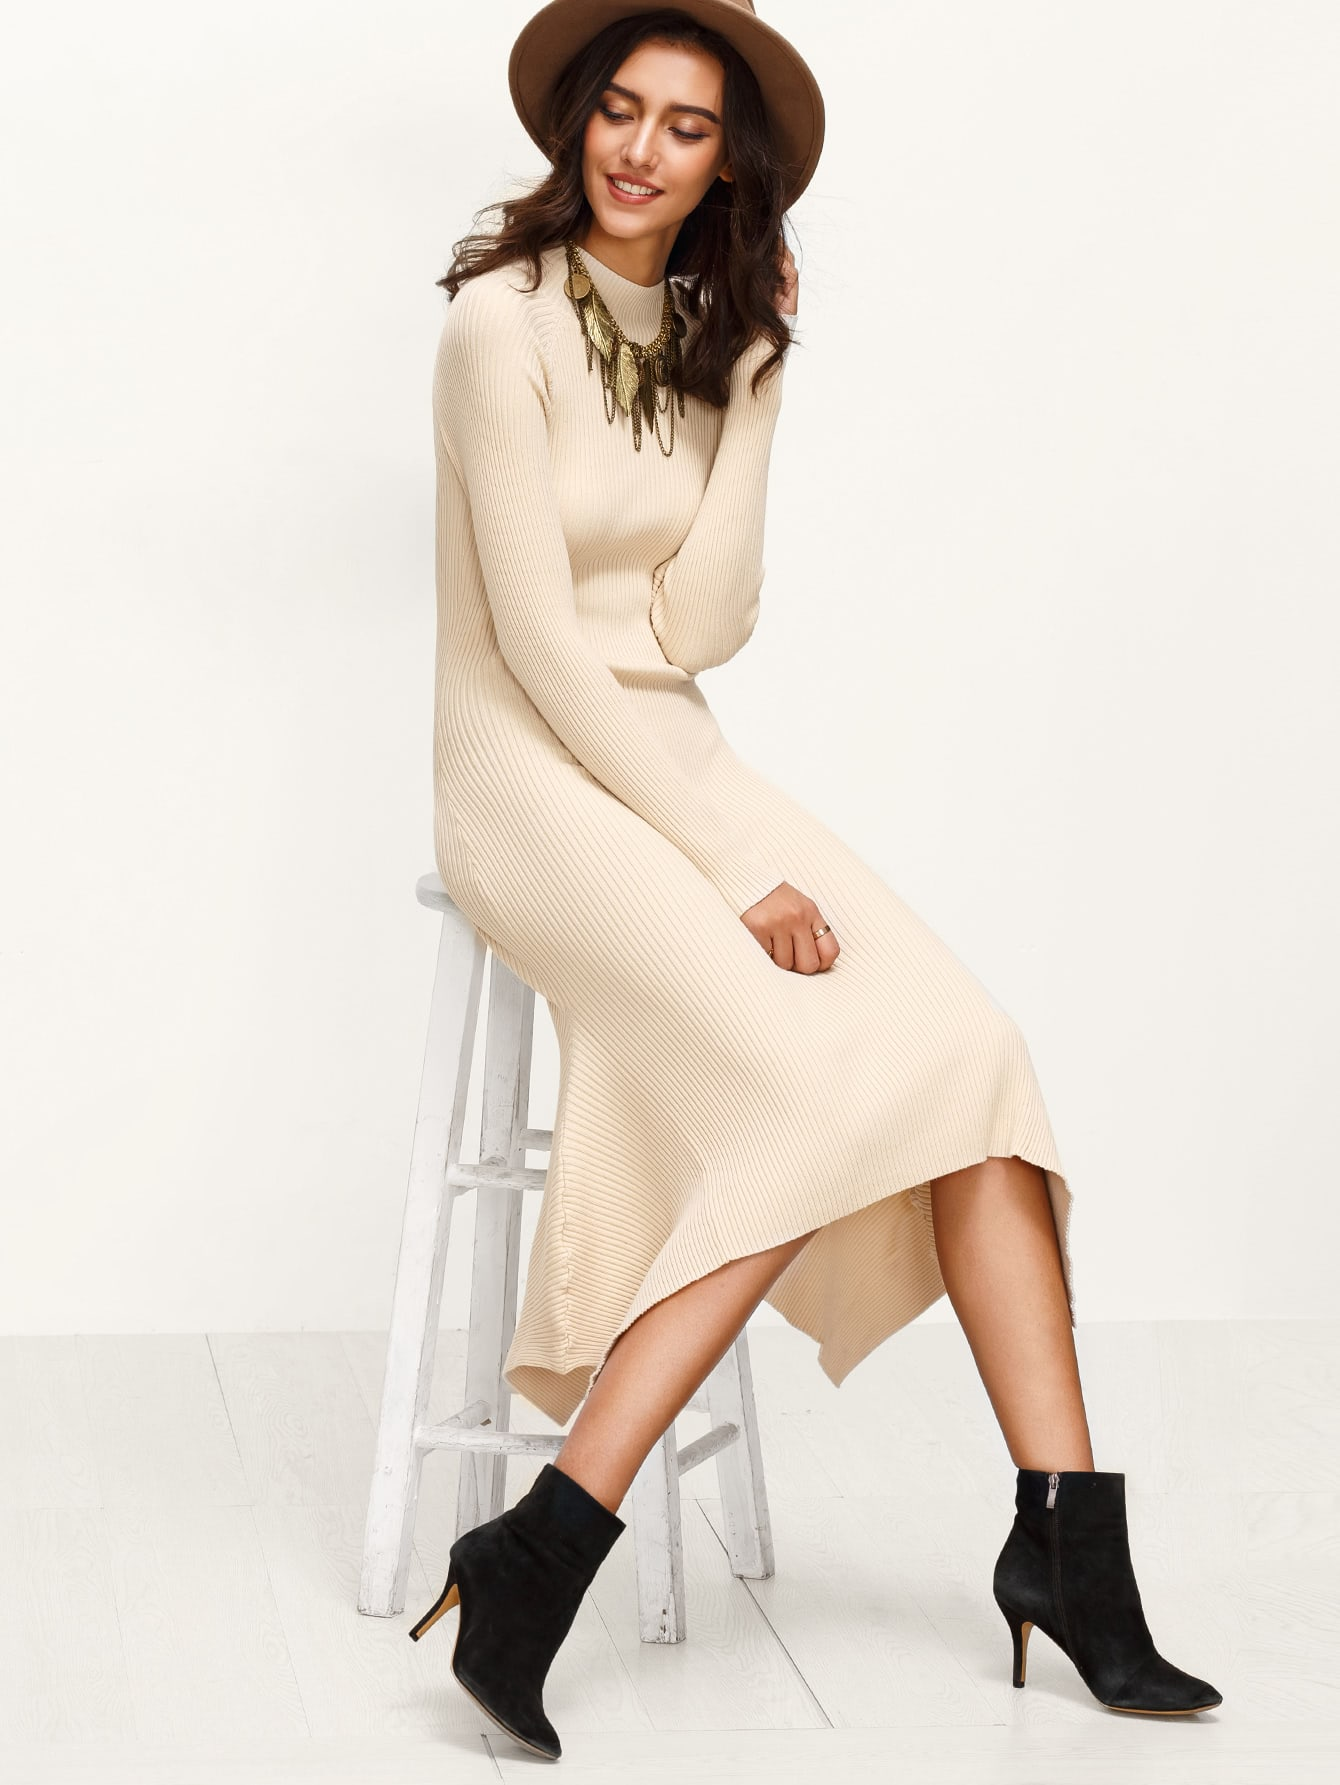 Apricot Ribbed Knit Cutout Lace Up Back Asymmetric Dress dress161026451